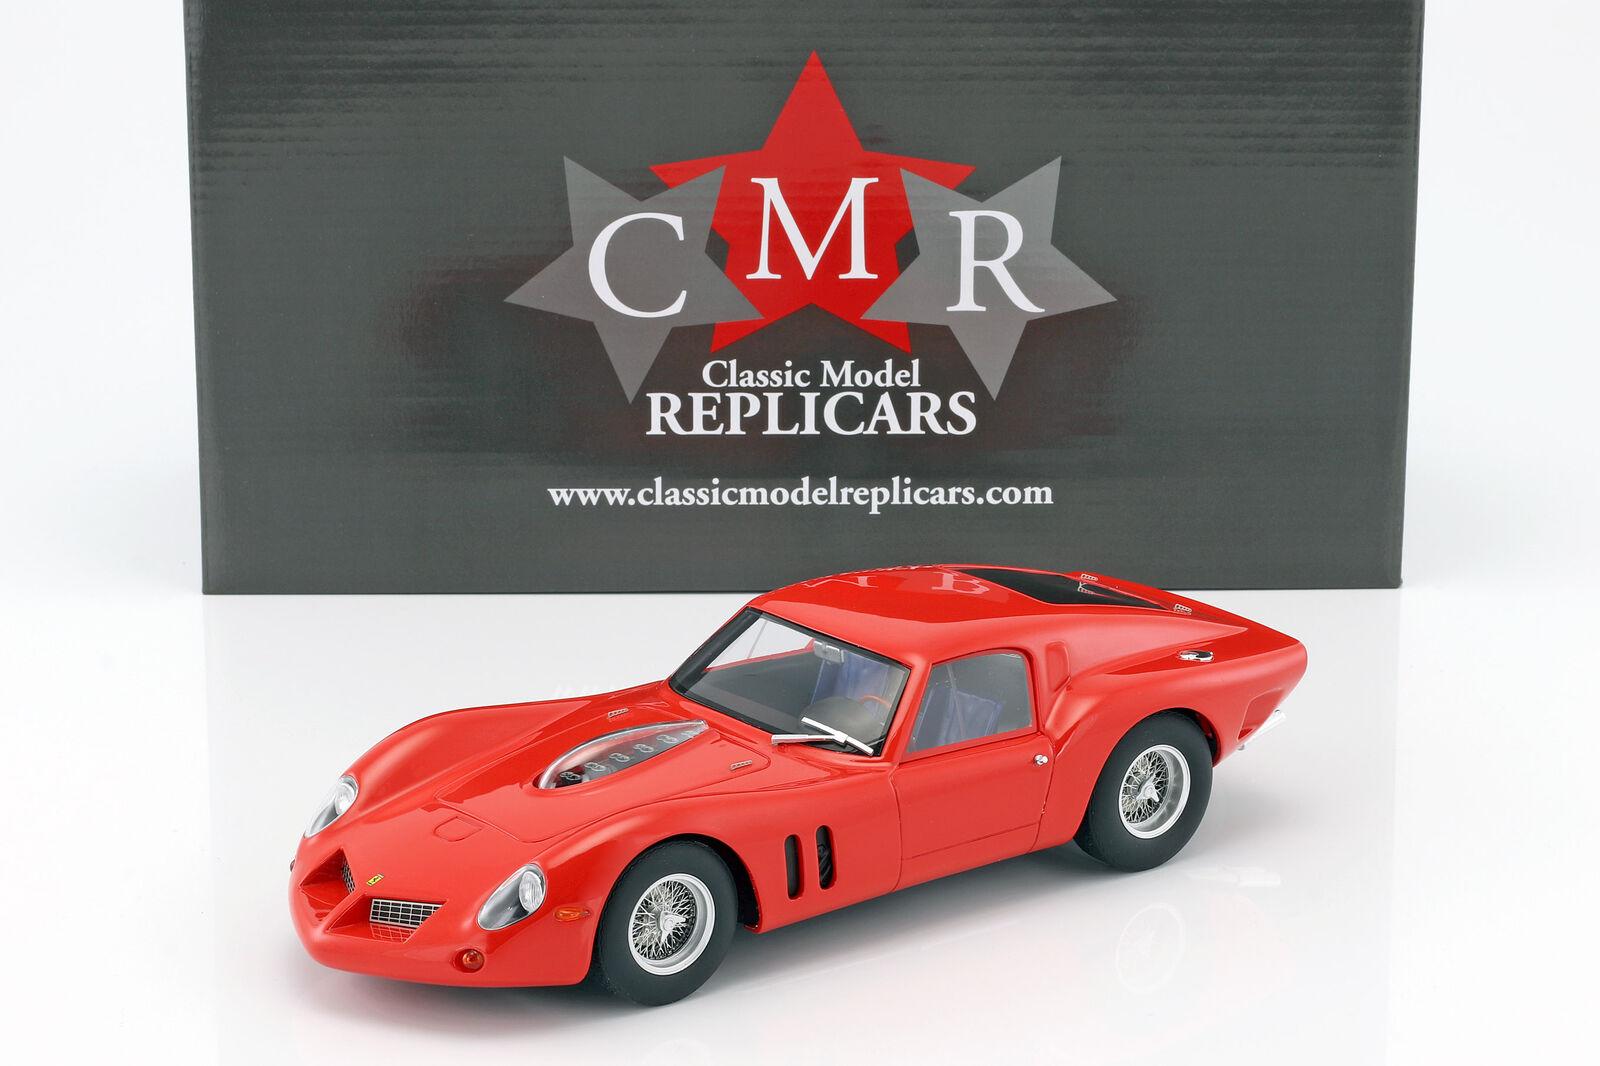 CMR 1/18 フェラーリ 250 GT ドロゴ プレーンボディ バージョン レッド Ferrari 250 GT Drogo Plain Body Version red